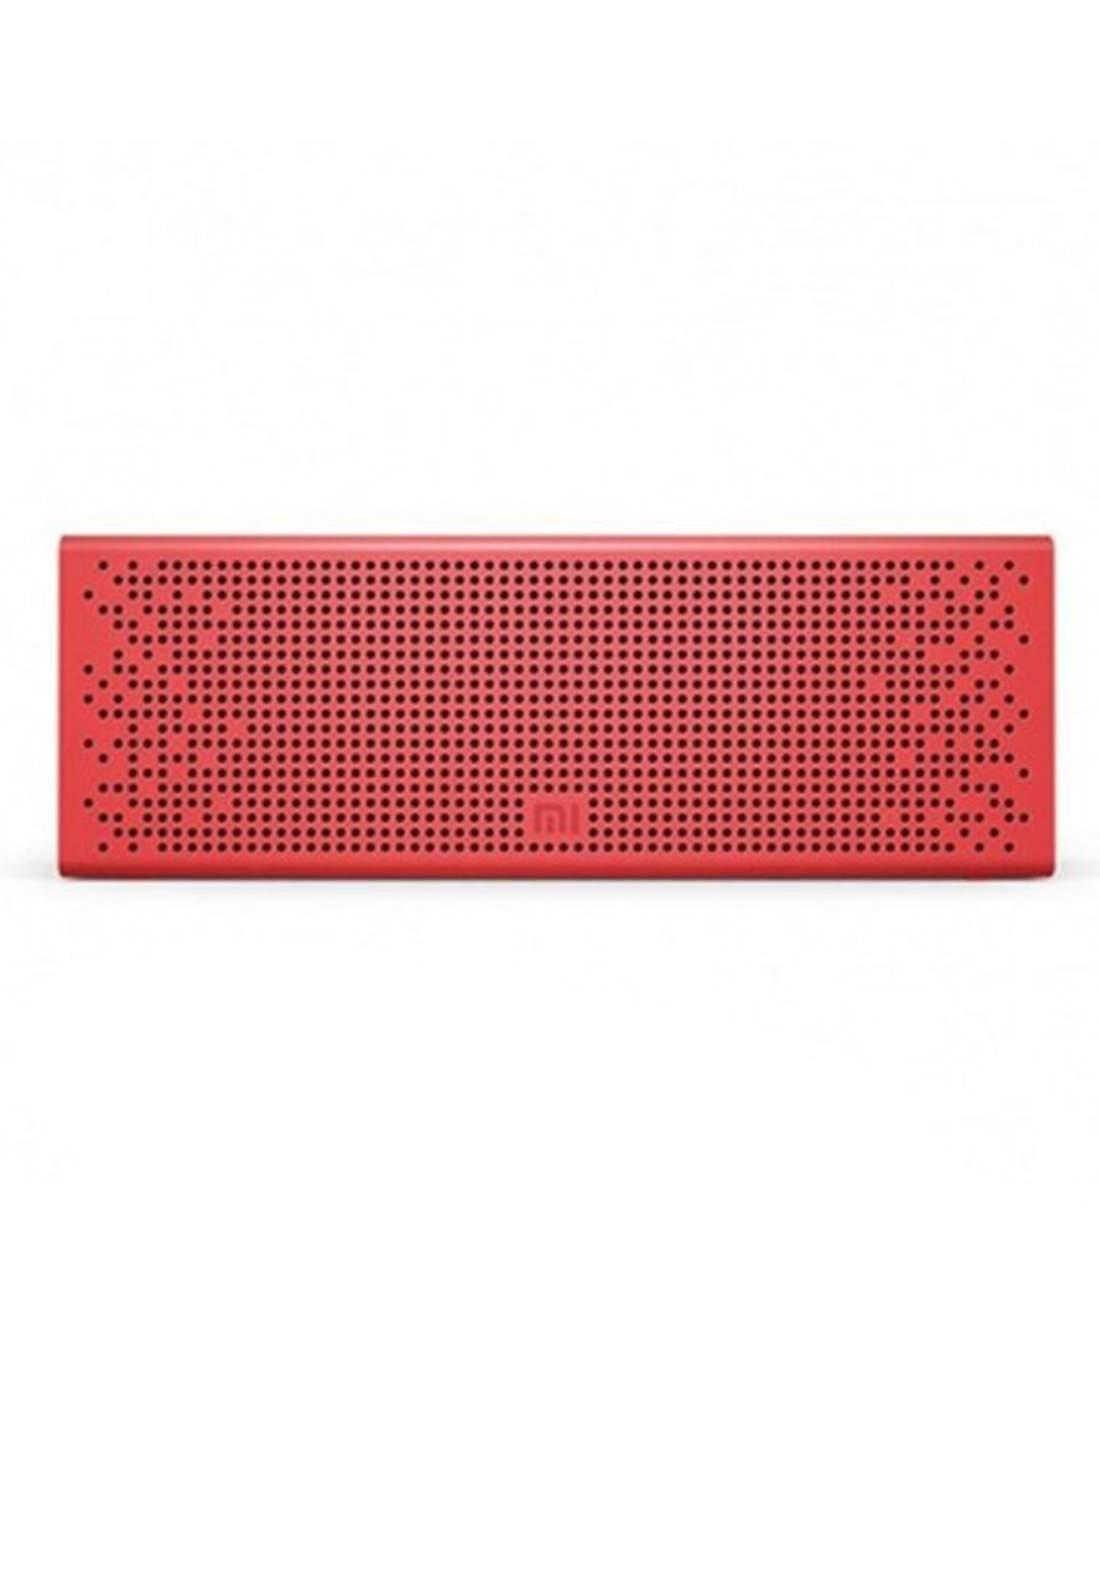 Xiaomi Mi Bluetooth Speaker Red  مكبر صوت